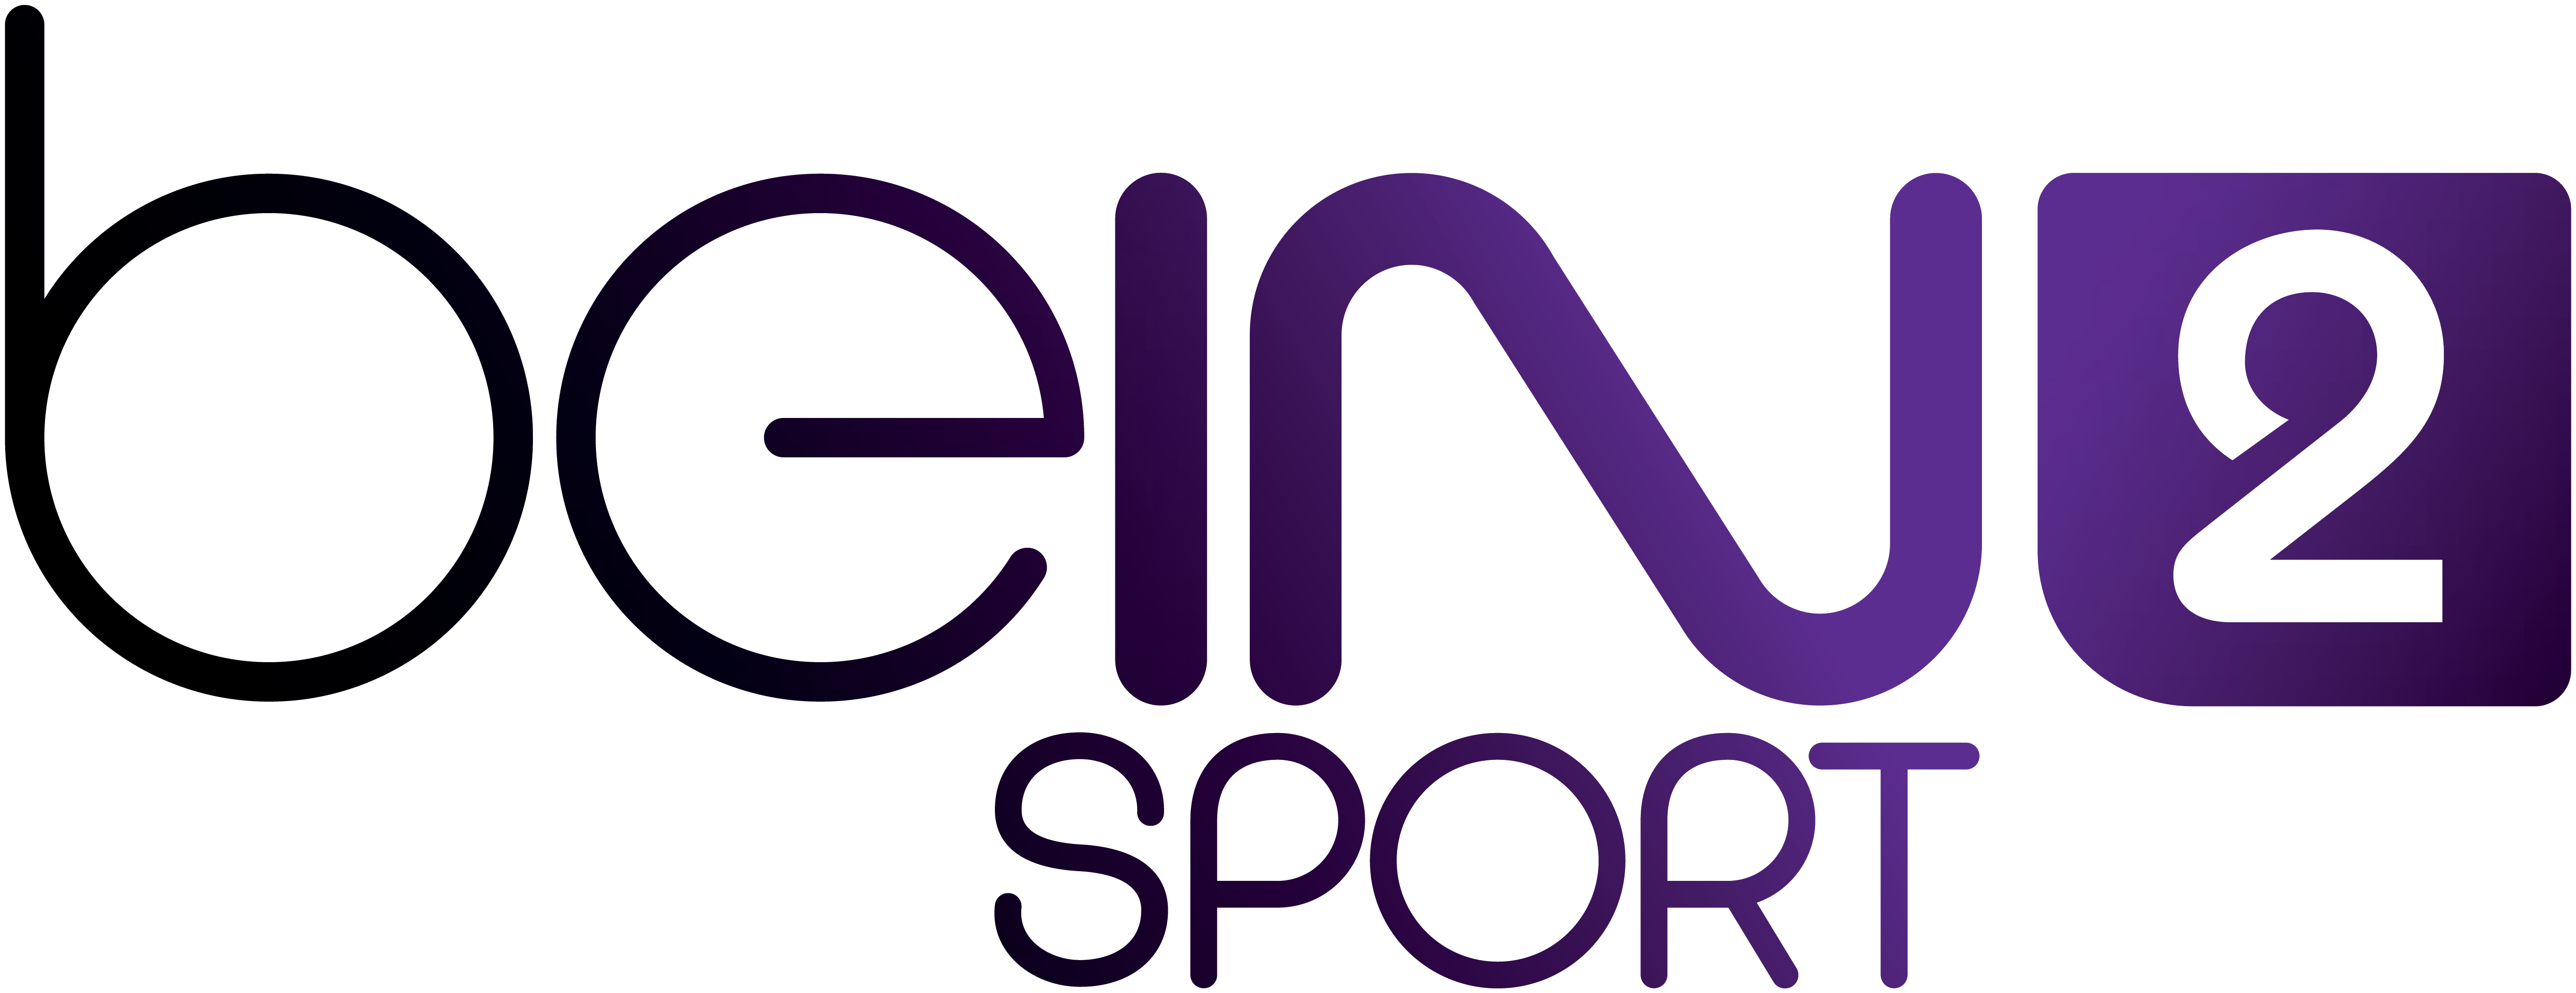 Image result for beIN Sport 2 logo png